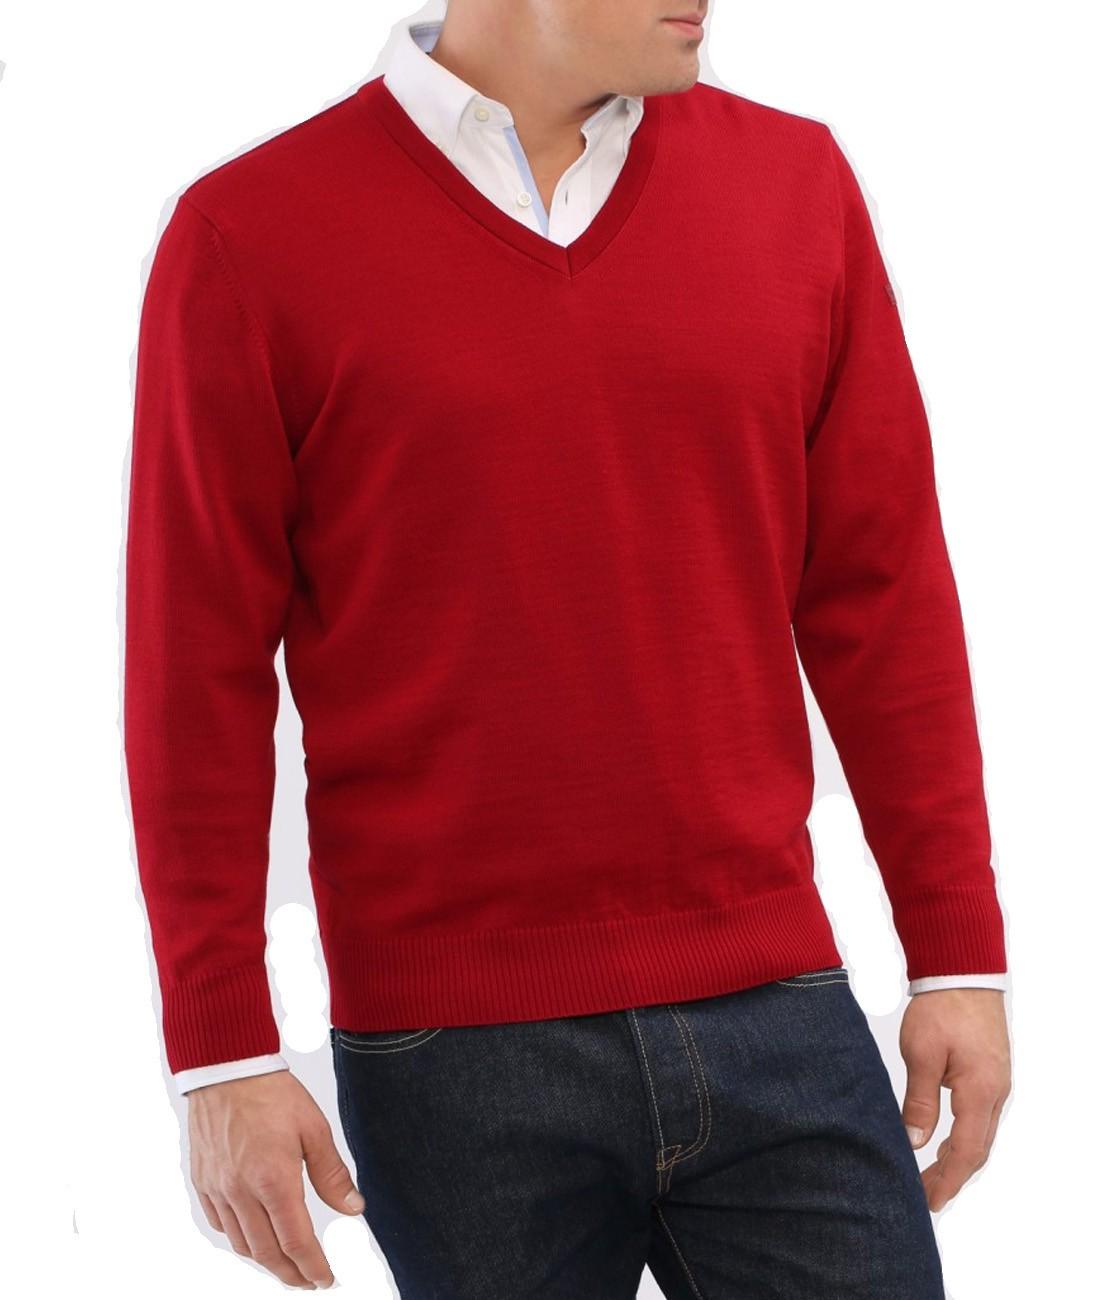 meet 727bc 6454f MAERZ Herren Pullover V-Ausschnitt Merino Superwash 490400-440 Purpur |  Smartkauf-Herrenmode